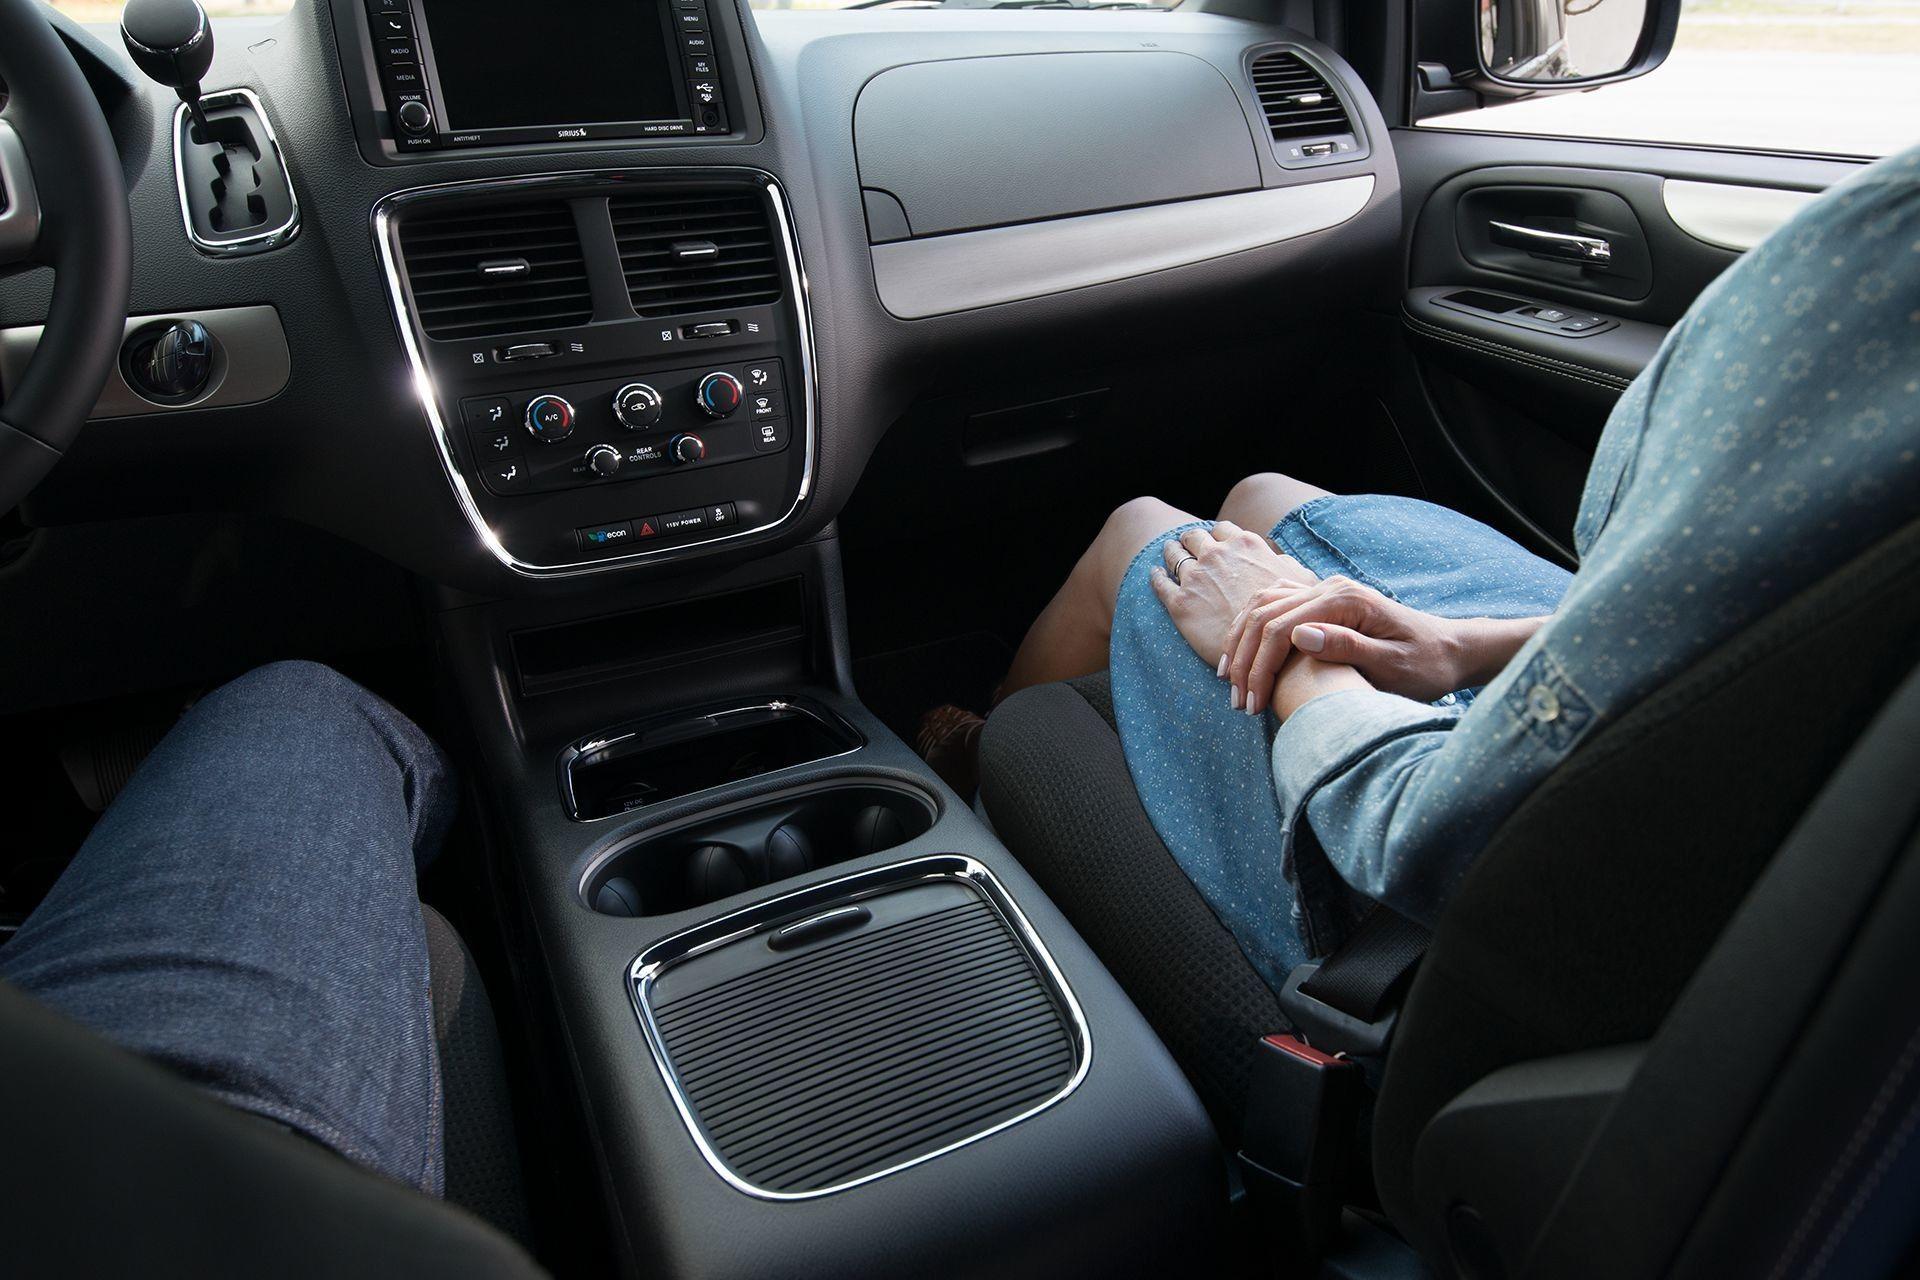 2019 Dodge Grand Caravan Interior Grand Caravan Caravan Interior Dodge